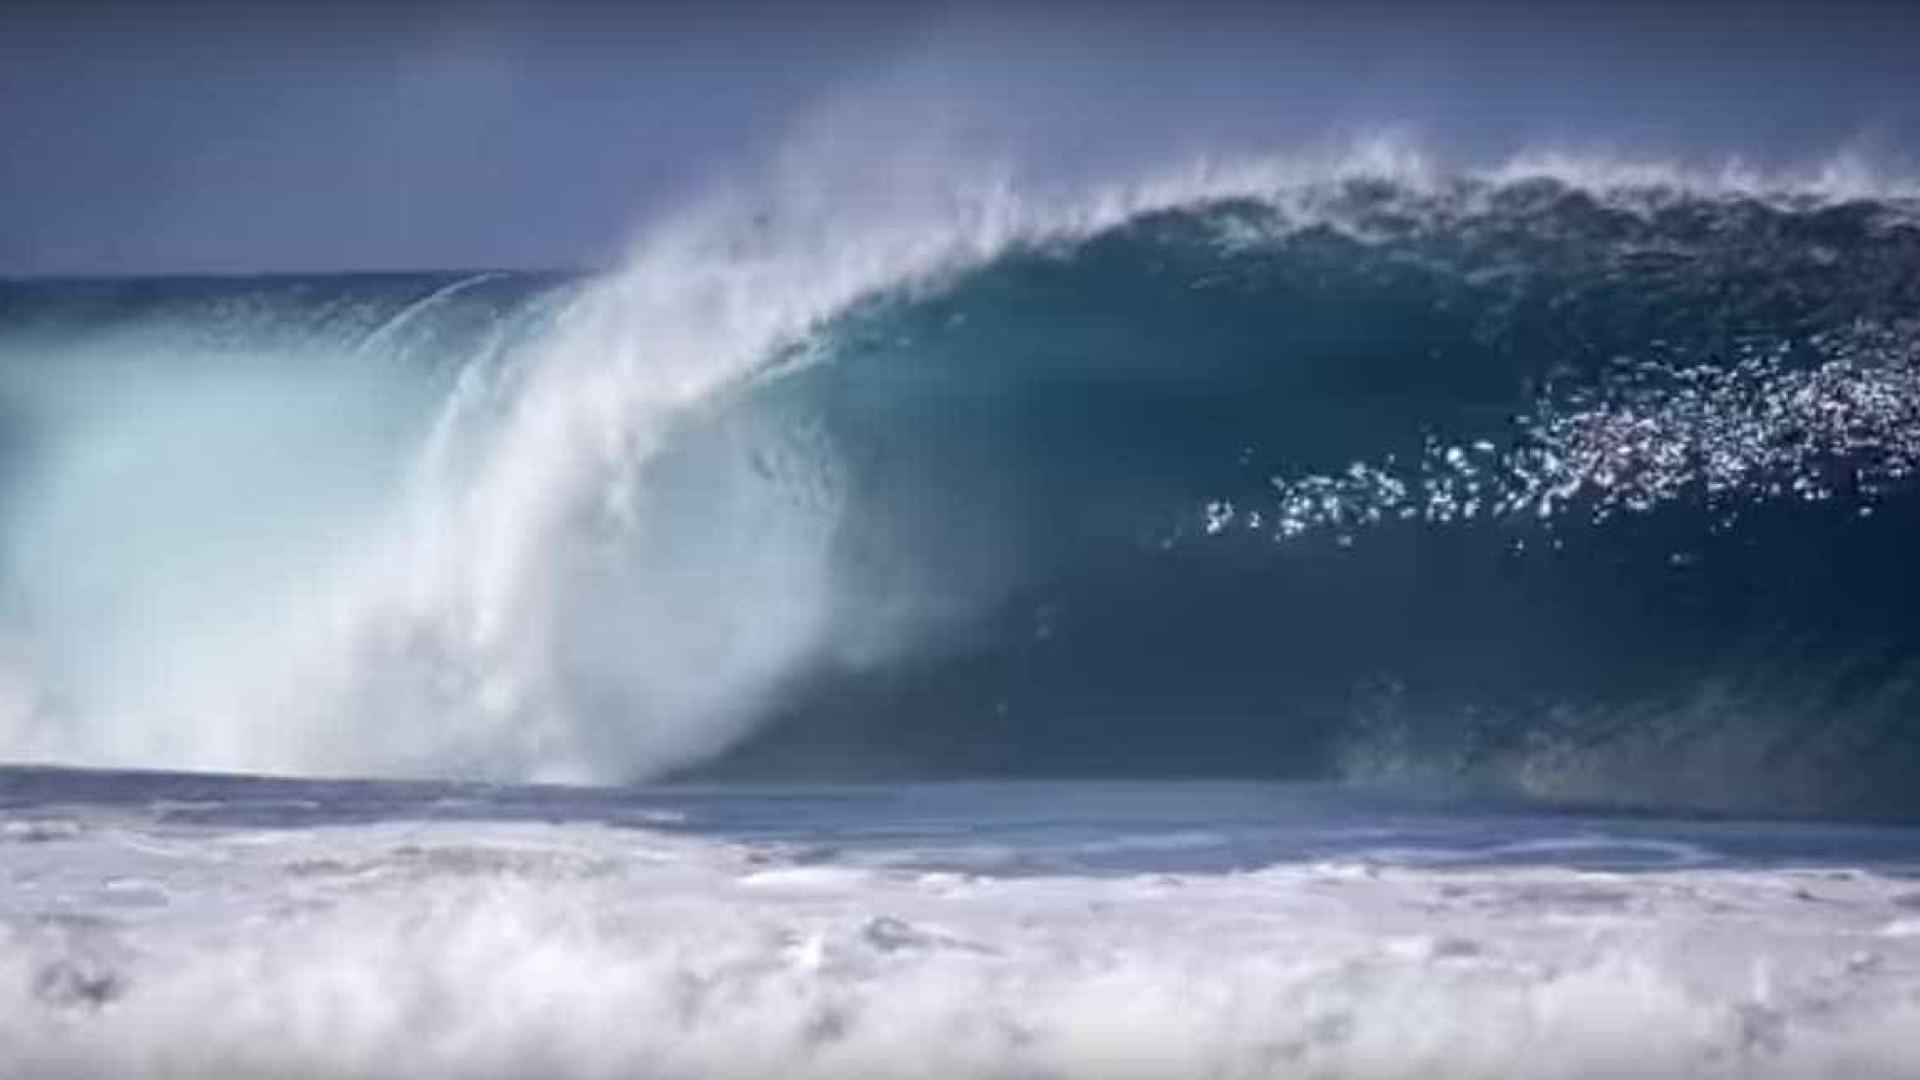 Respire fundo para ver as quedas mais terroríficas nas ondas do México